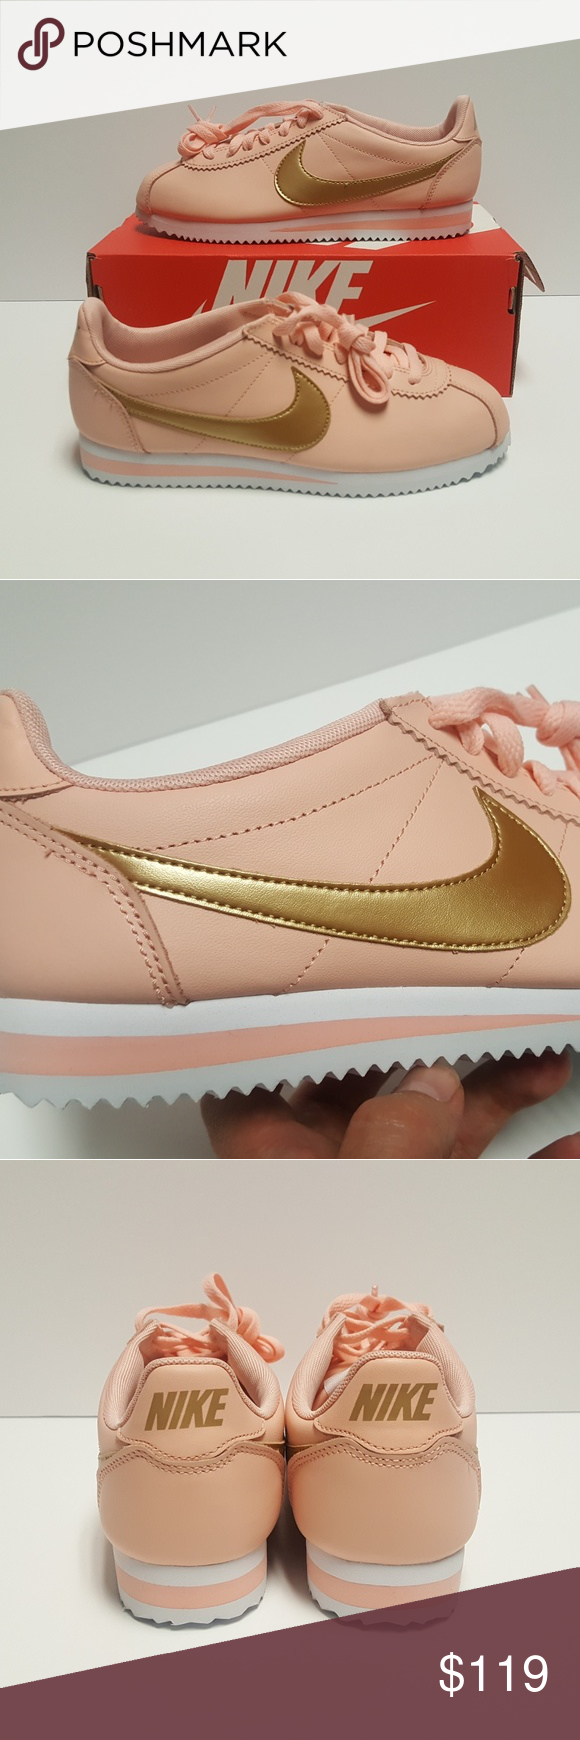 separation shoes f5236 9c542 Nike Classic Cortez Leather Women s Peach Orange Nike Classic Cortez  Leather Women s Size 8 New Peach